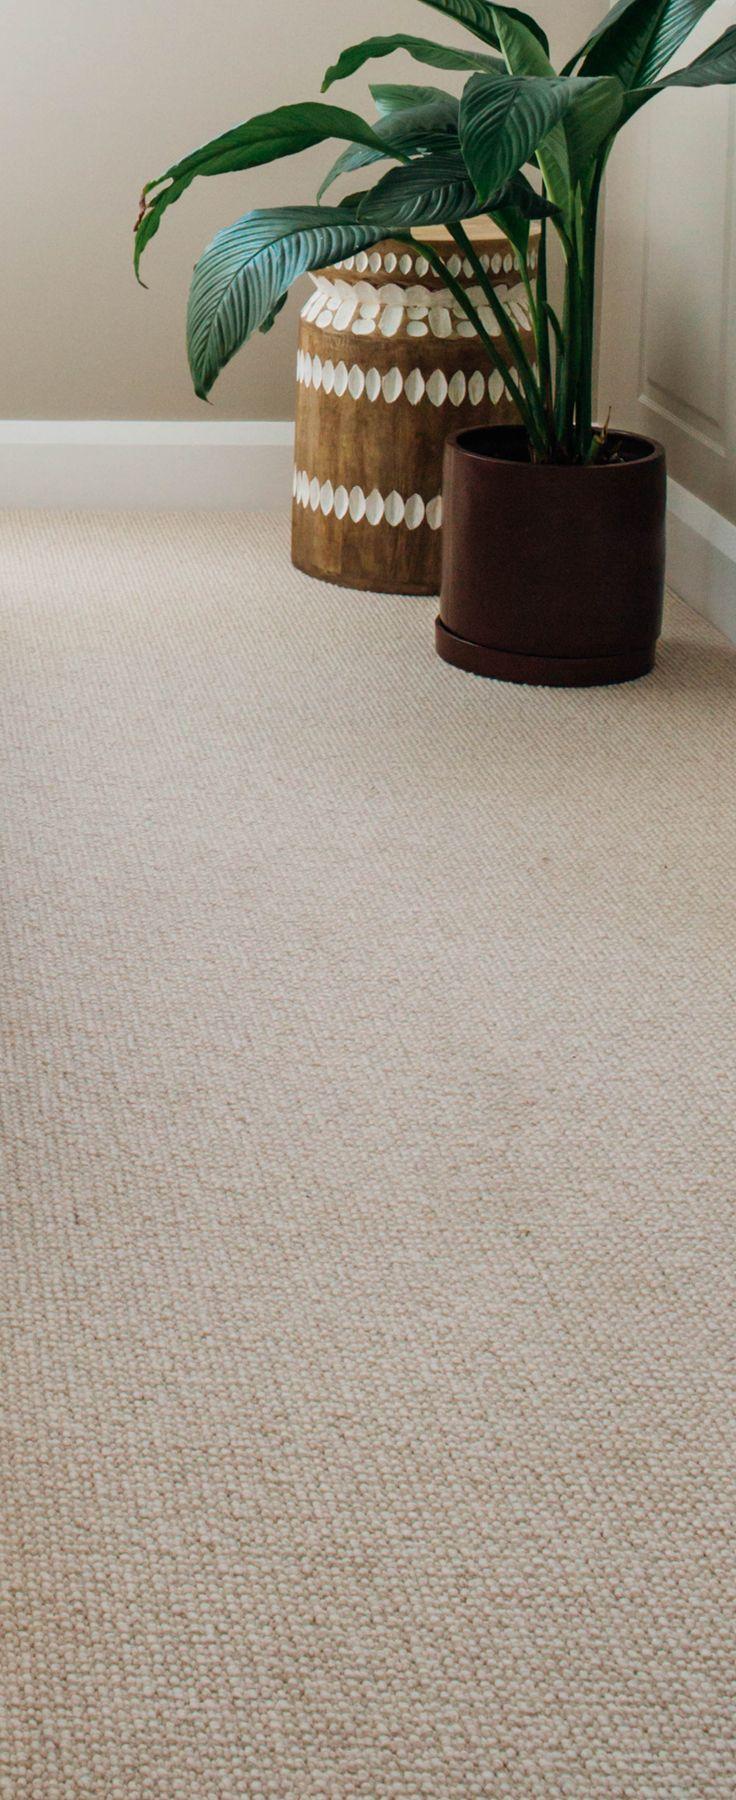 30 Modern Bedroom Carpet Ideas Bedroom Carpet Wool Carpet Room Carpet